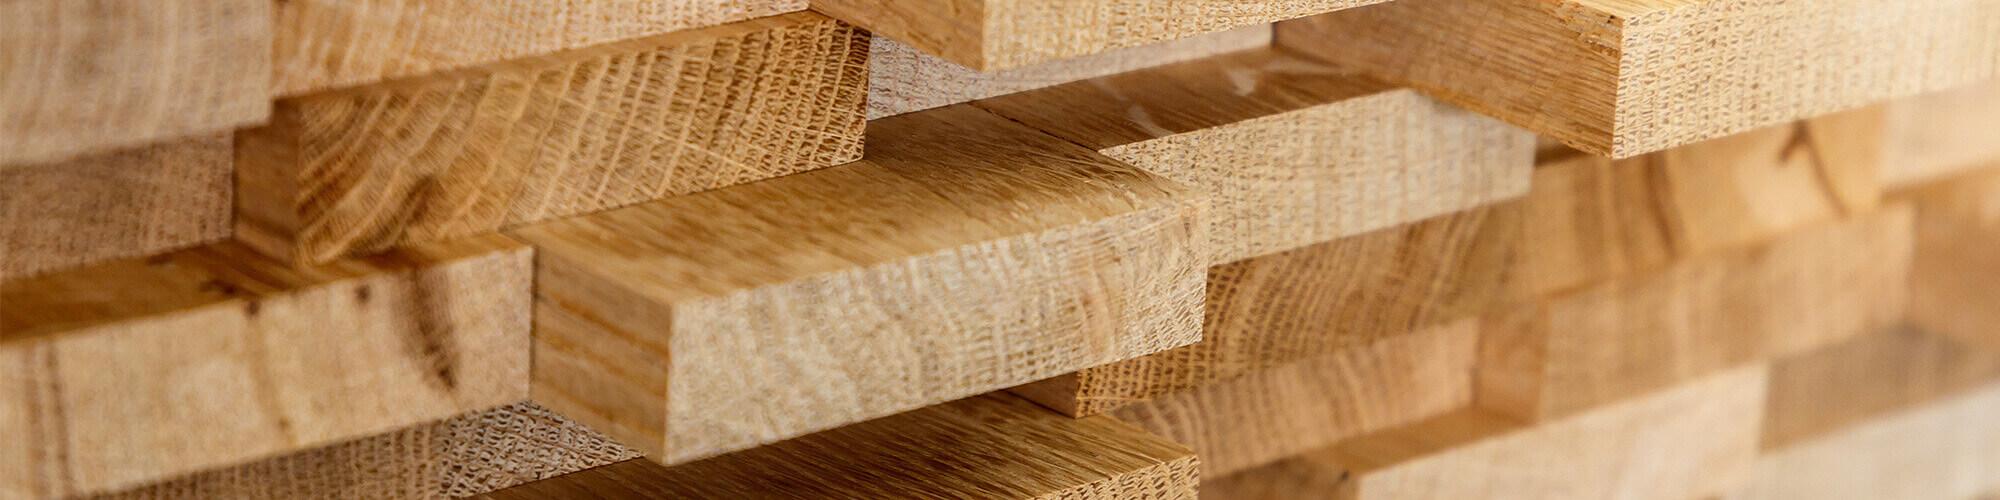 Lumber production